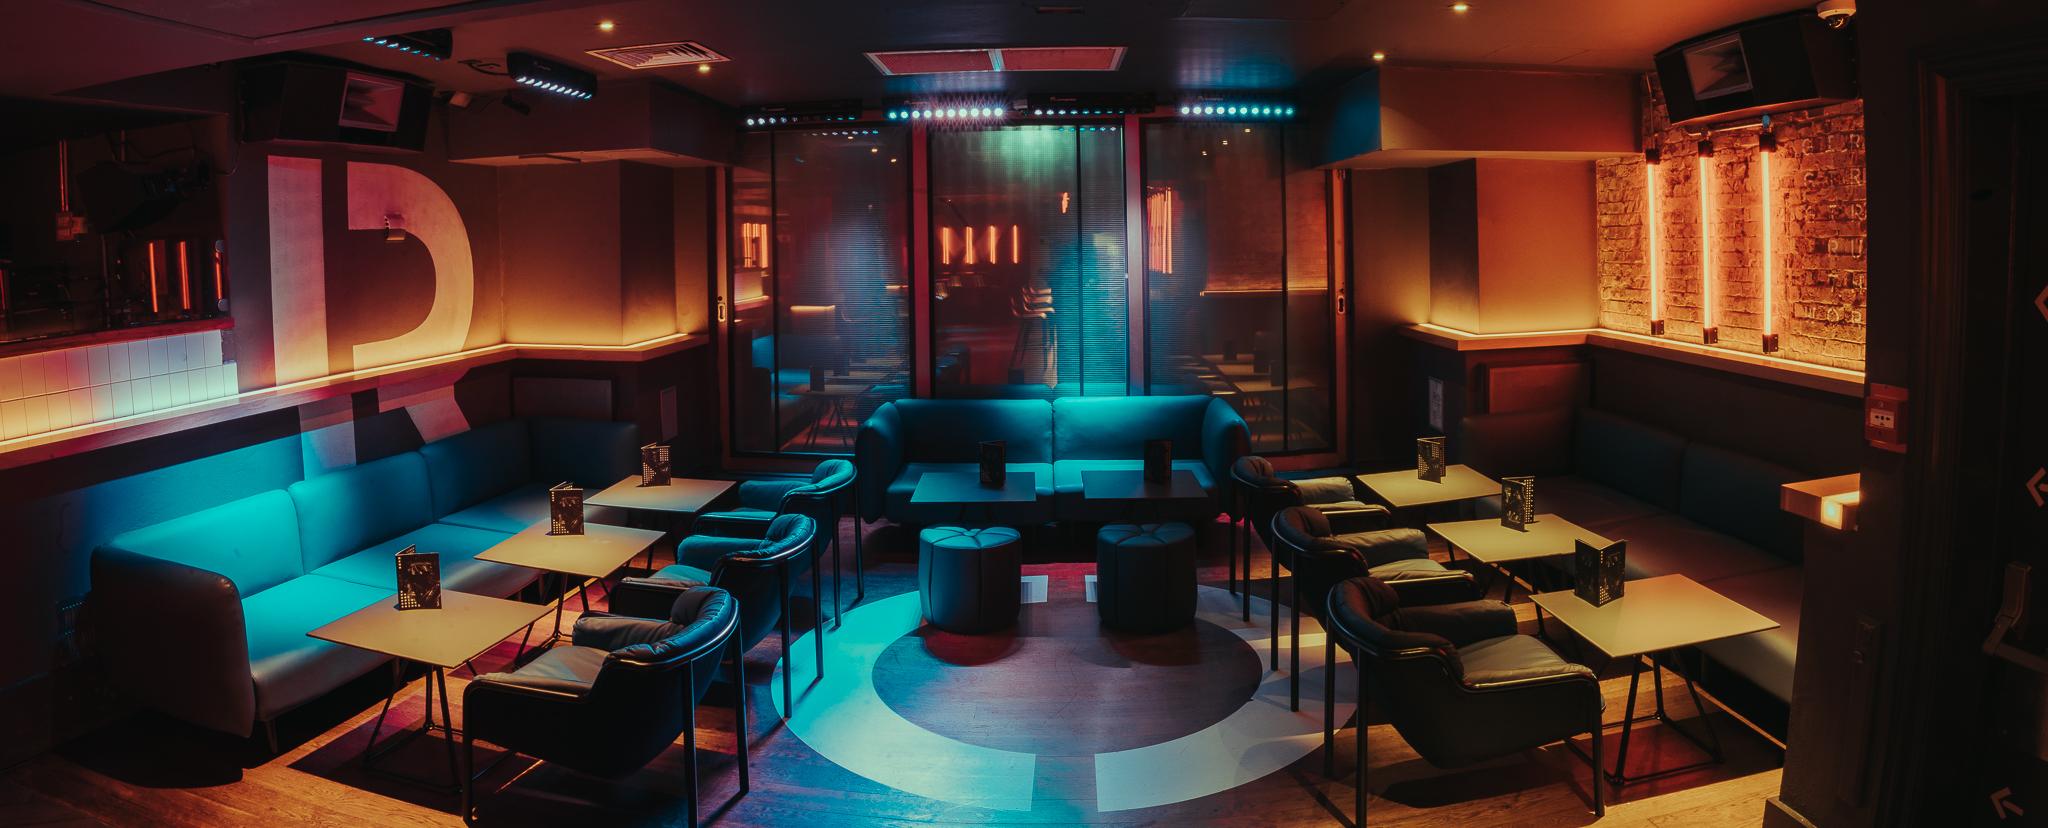 roxy bar rathbone place soho london reviews